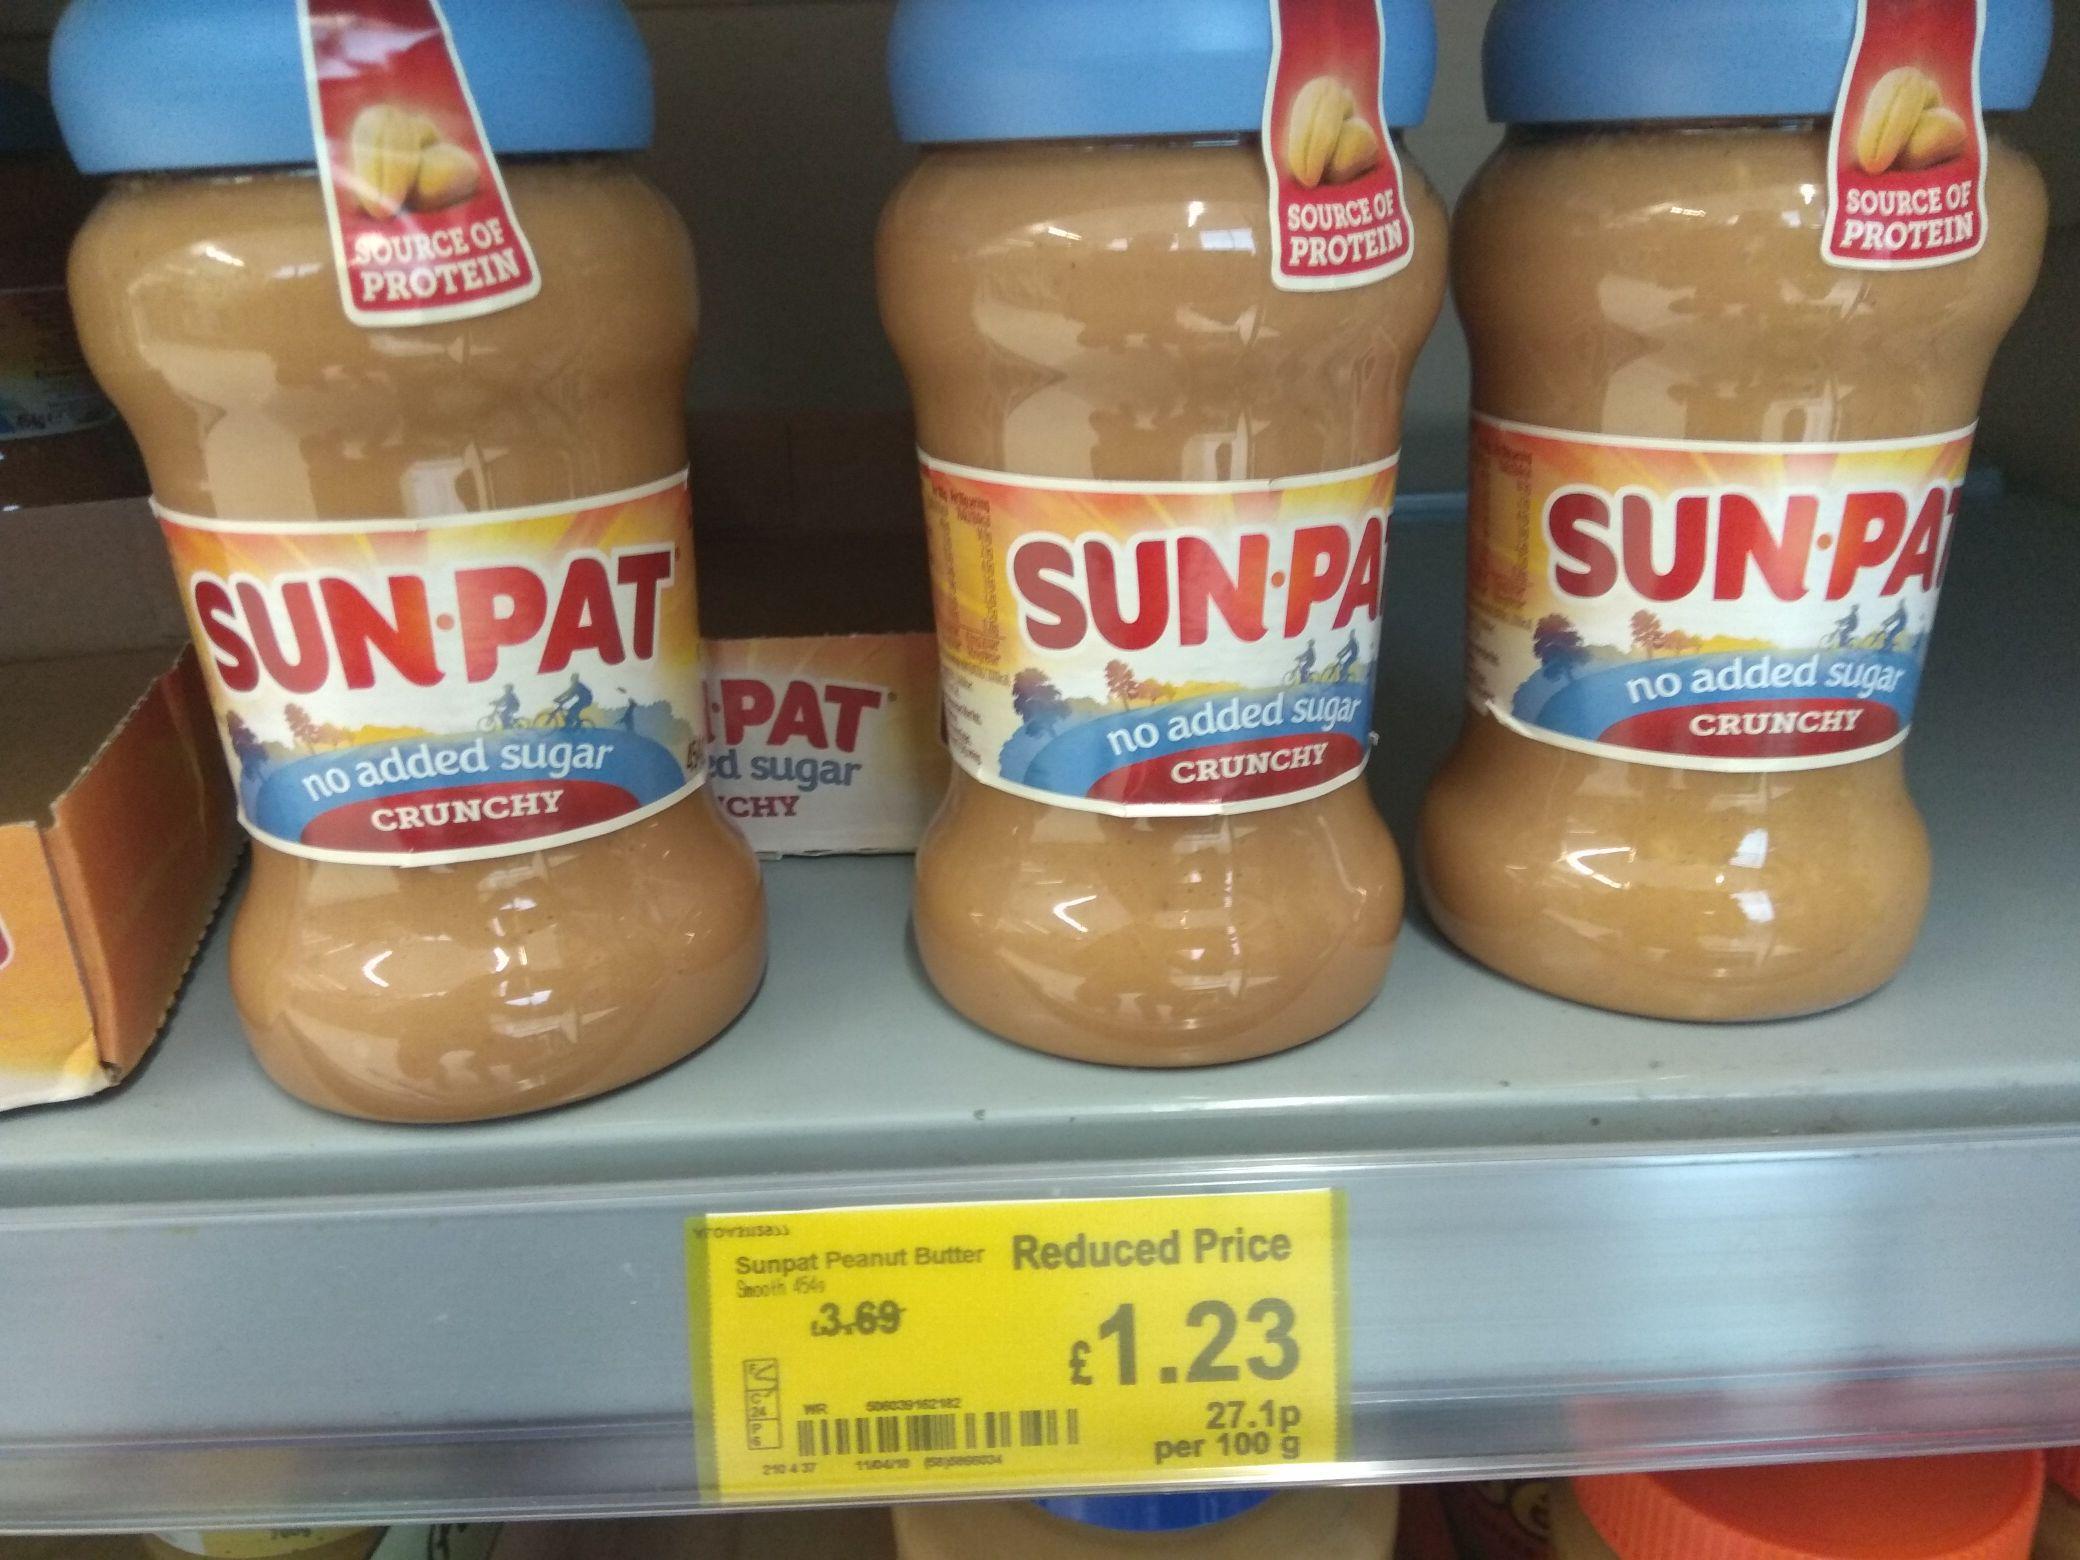 Sun.pat no added sugar peanut butter 454g jar at Asda for £1.23